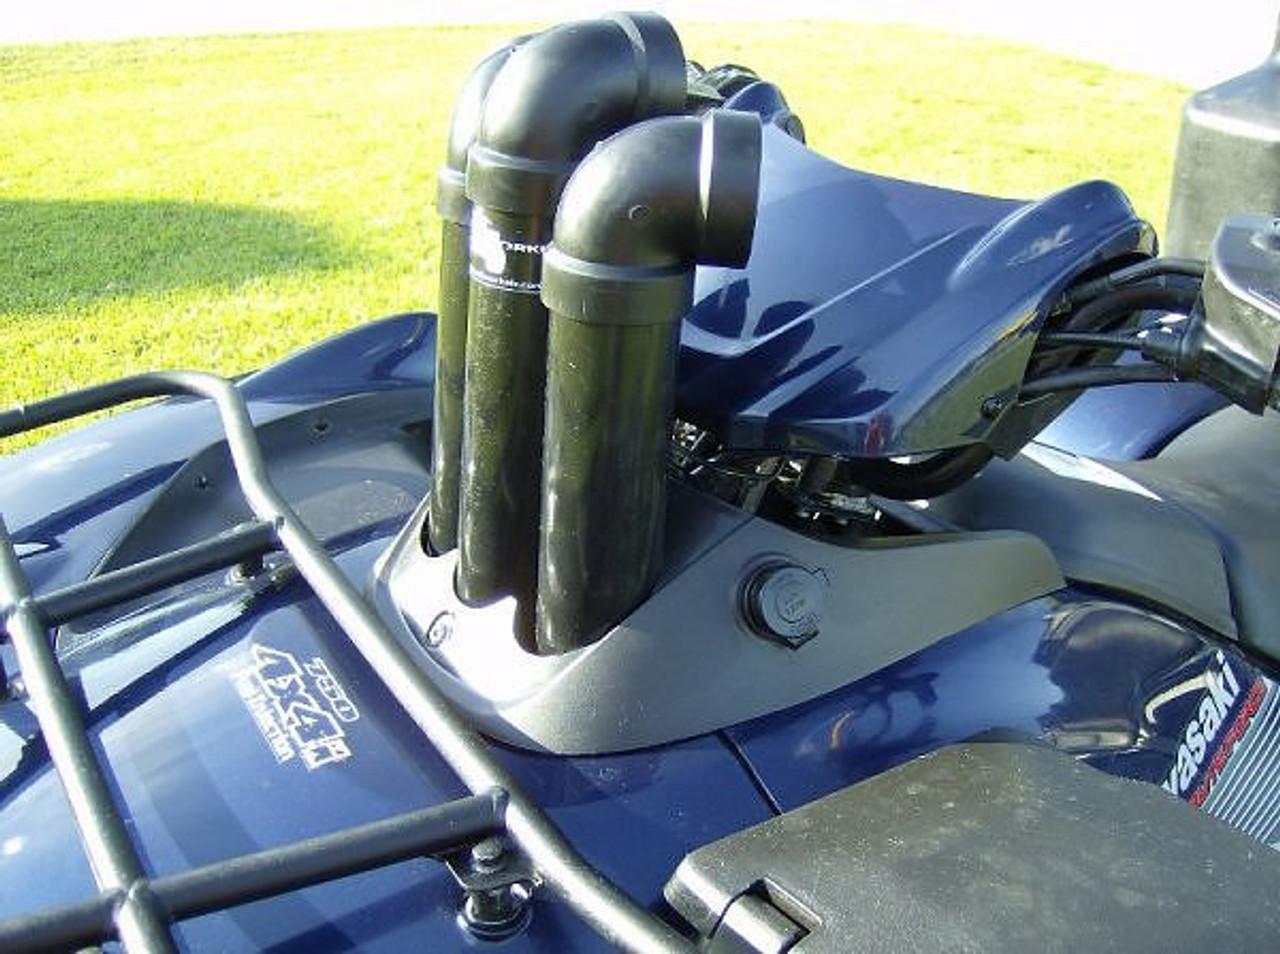 Kawasaki Brute Force 650 & 750 irs (05-11) Extreme Snorkels Kit